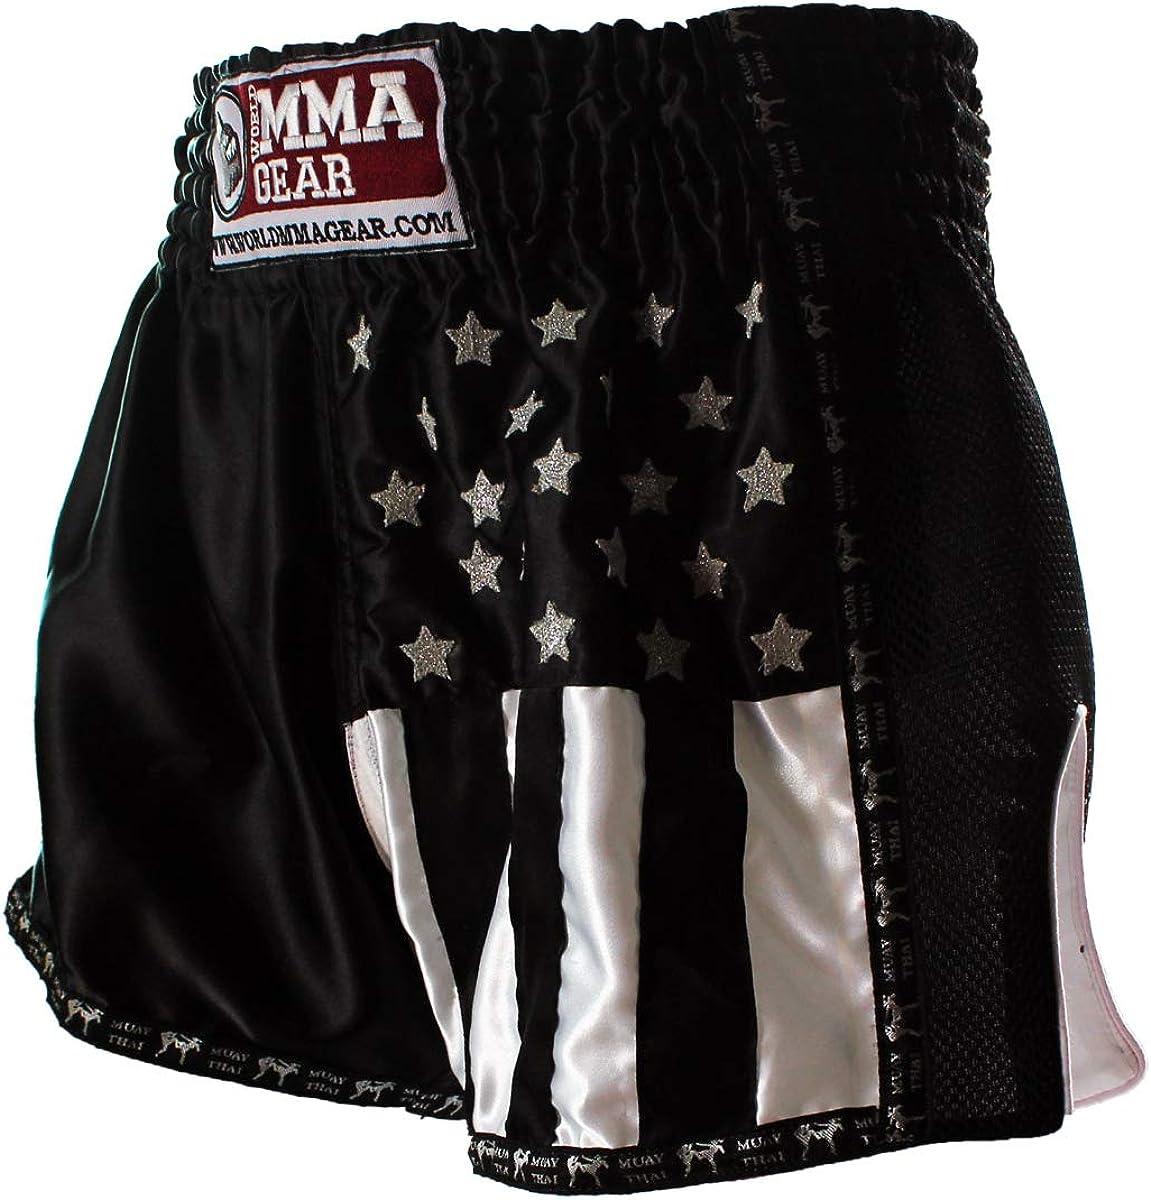 World Large special price MMA Gear Premium Muay San Antonio Mall Thai Kick Retro by - Handmade Shorts